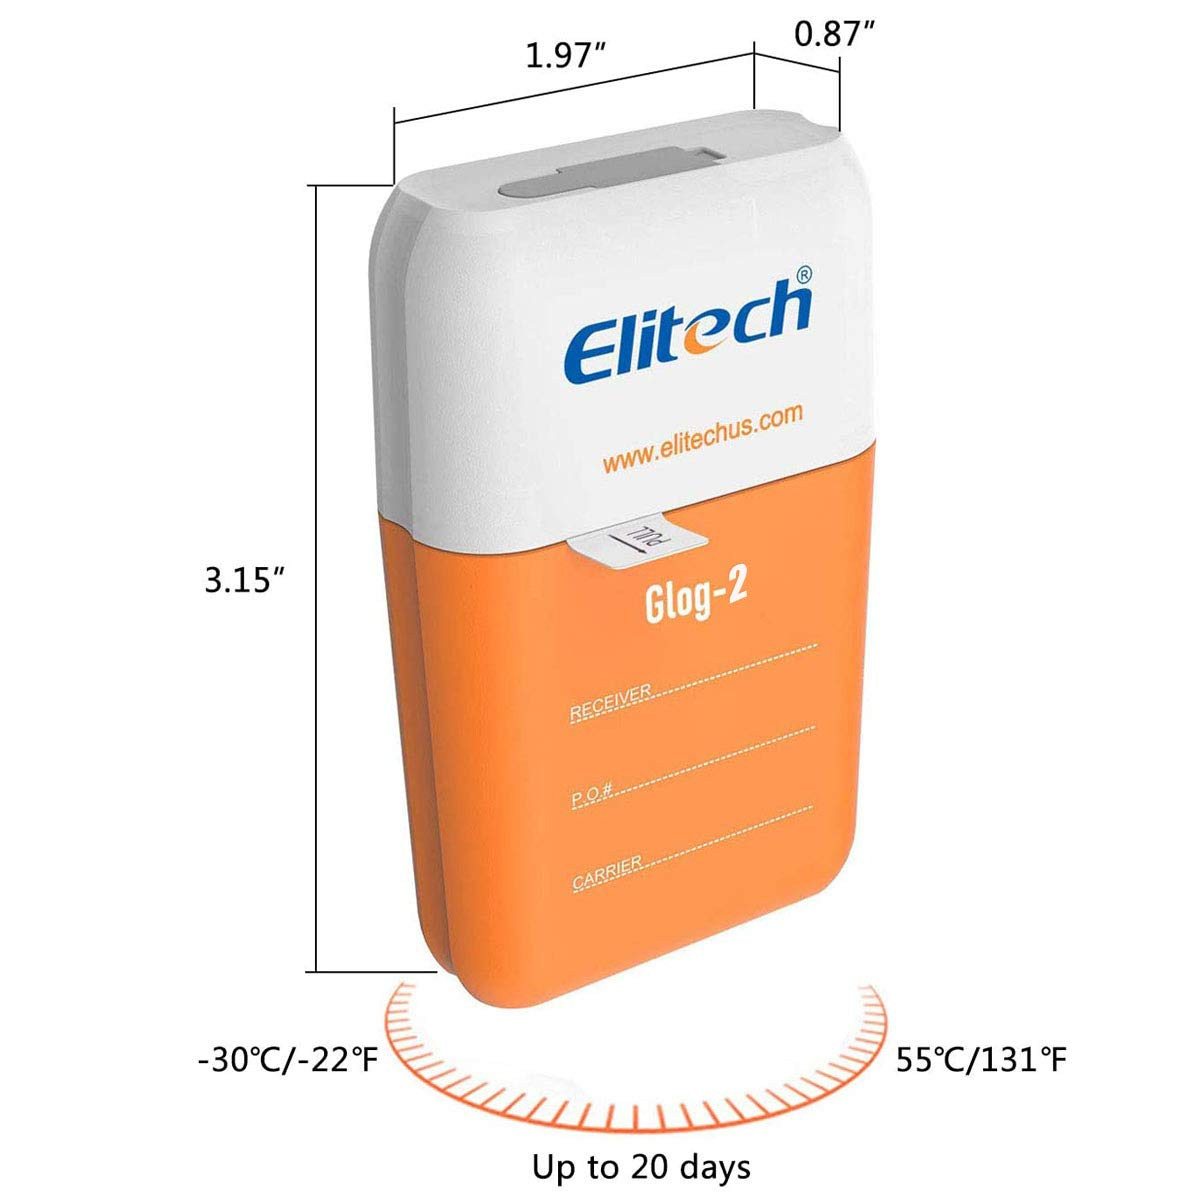 Elitech Glog 2 Singe-Use IoT Temperature Data Logger for Position and Illuminance